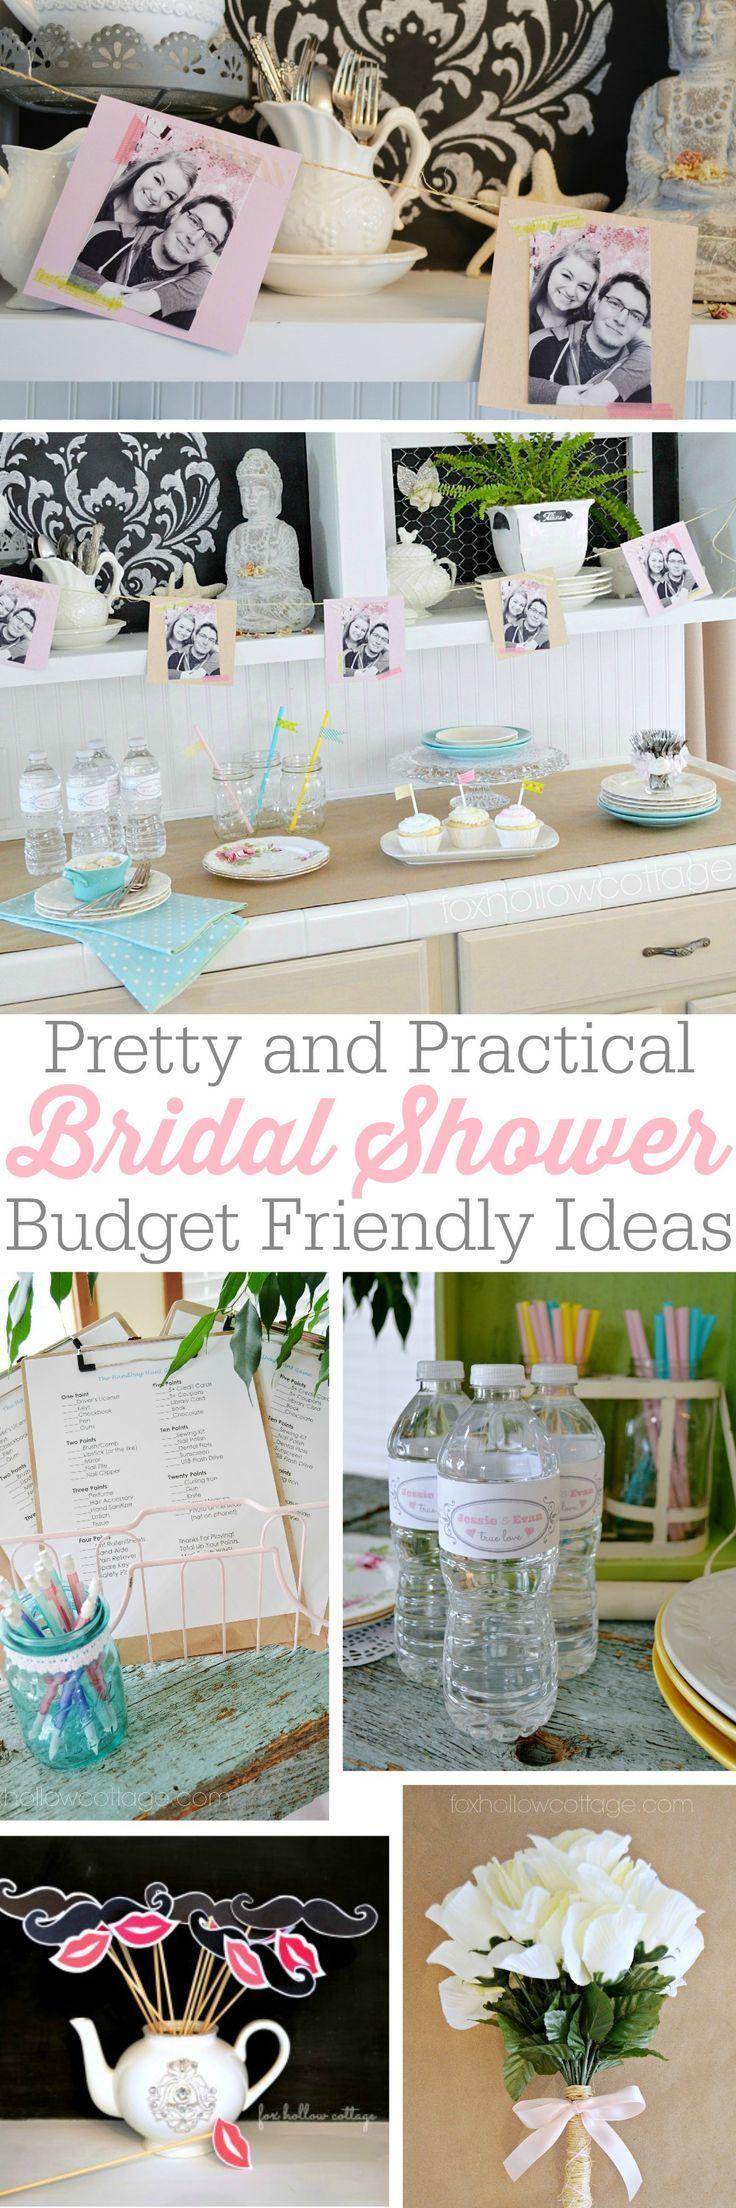 21 best bridal shower images on Pinterest   Bridal showers, Weddings ...